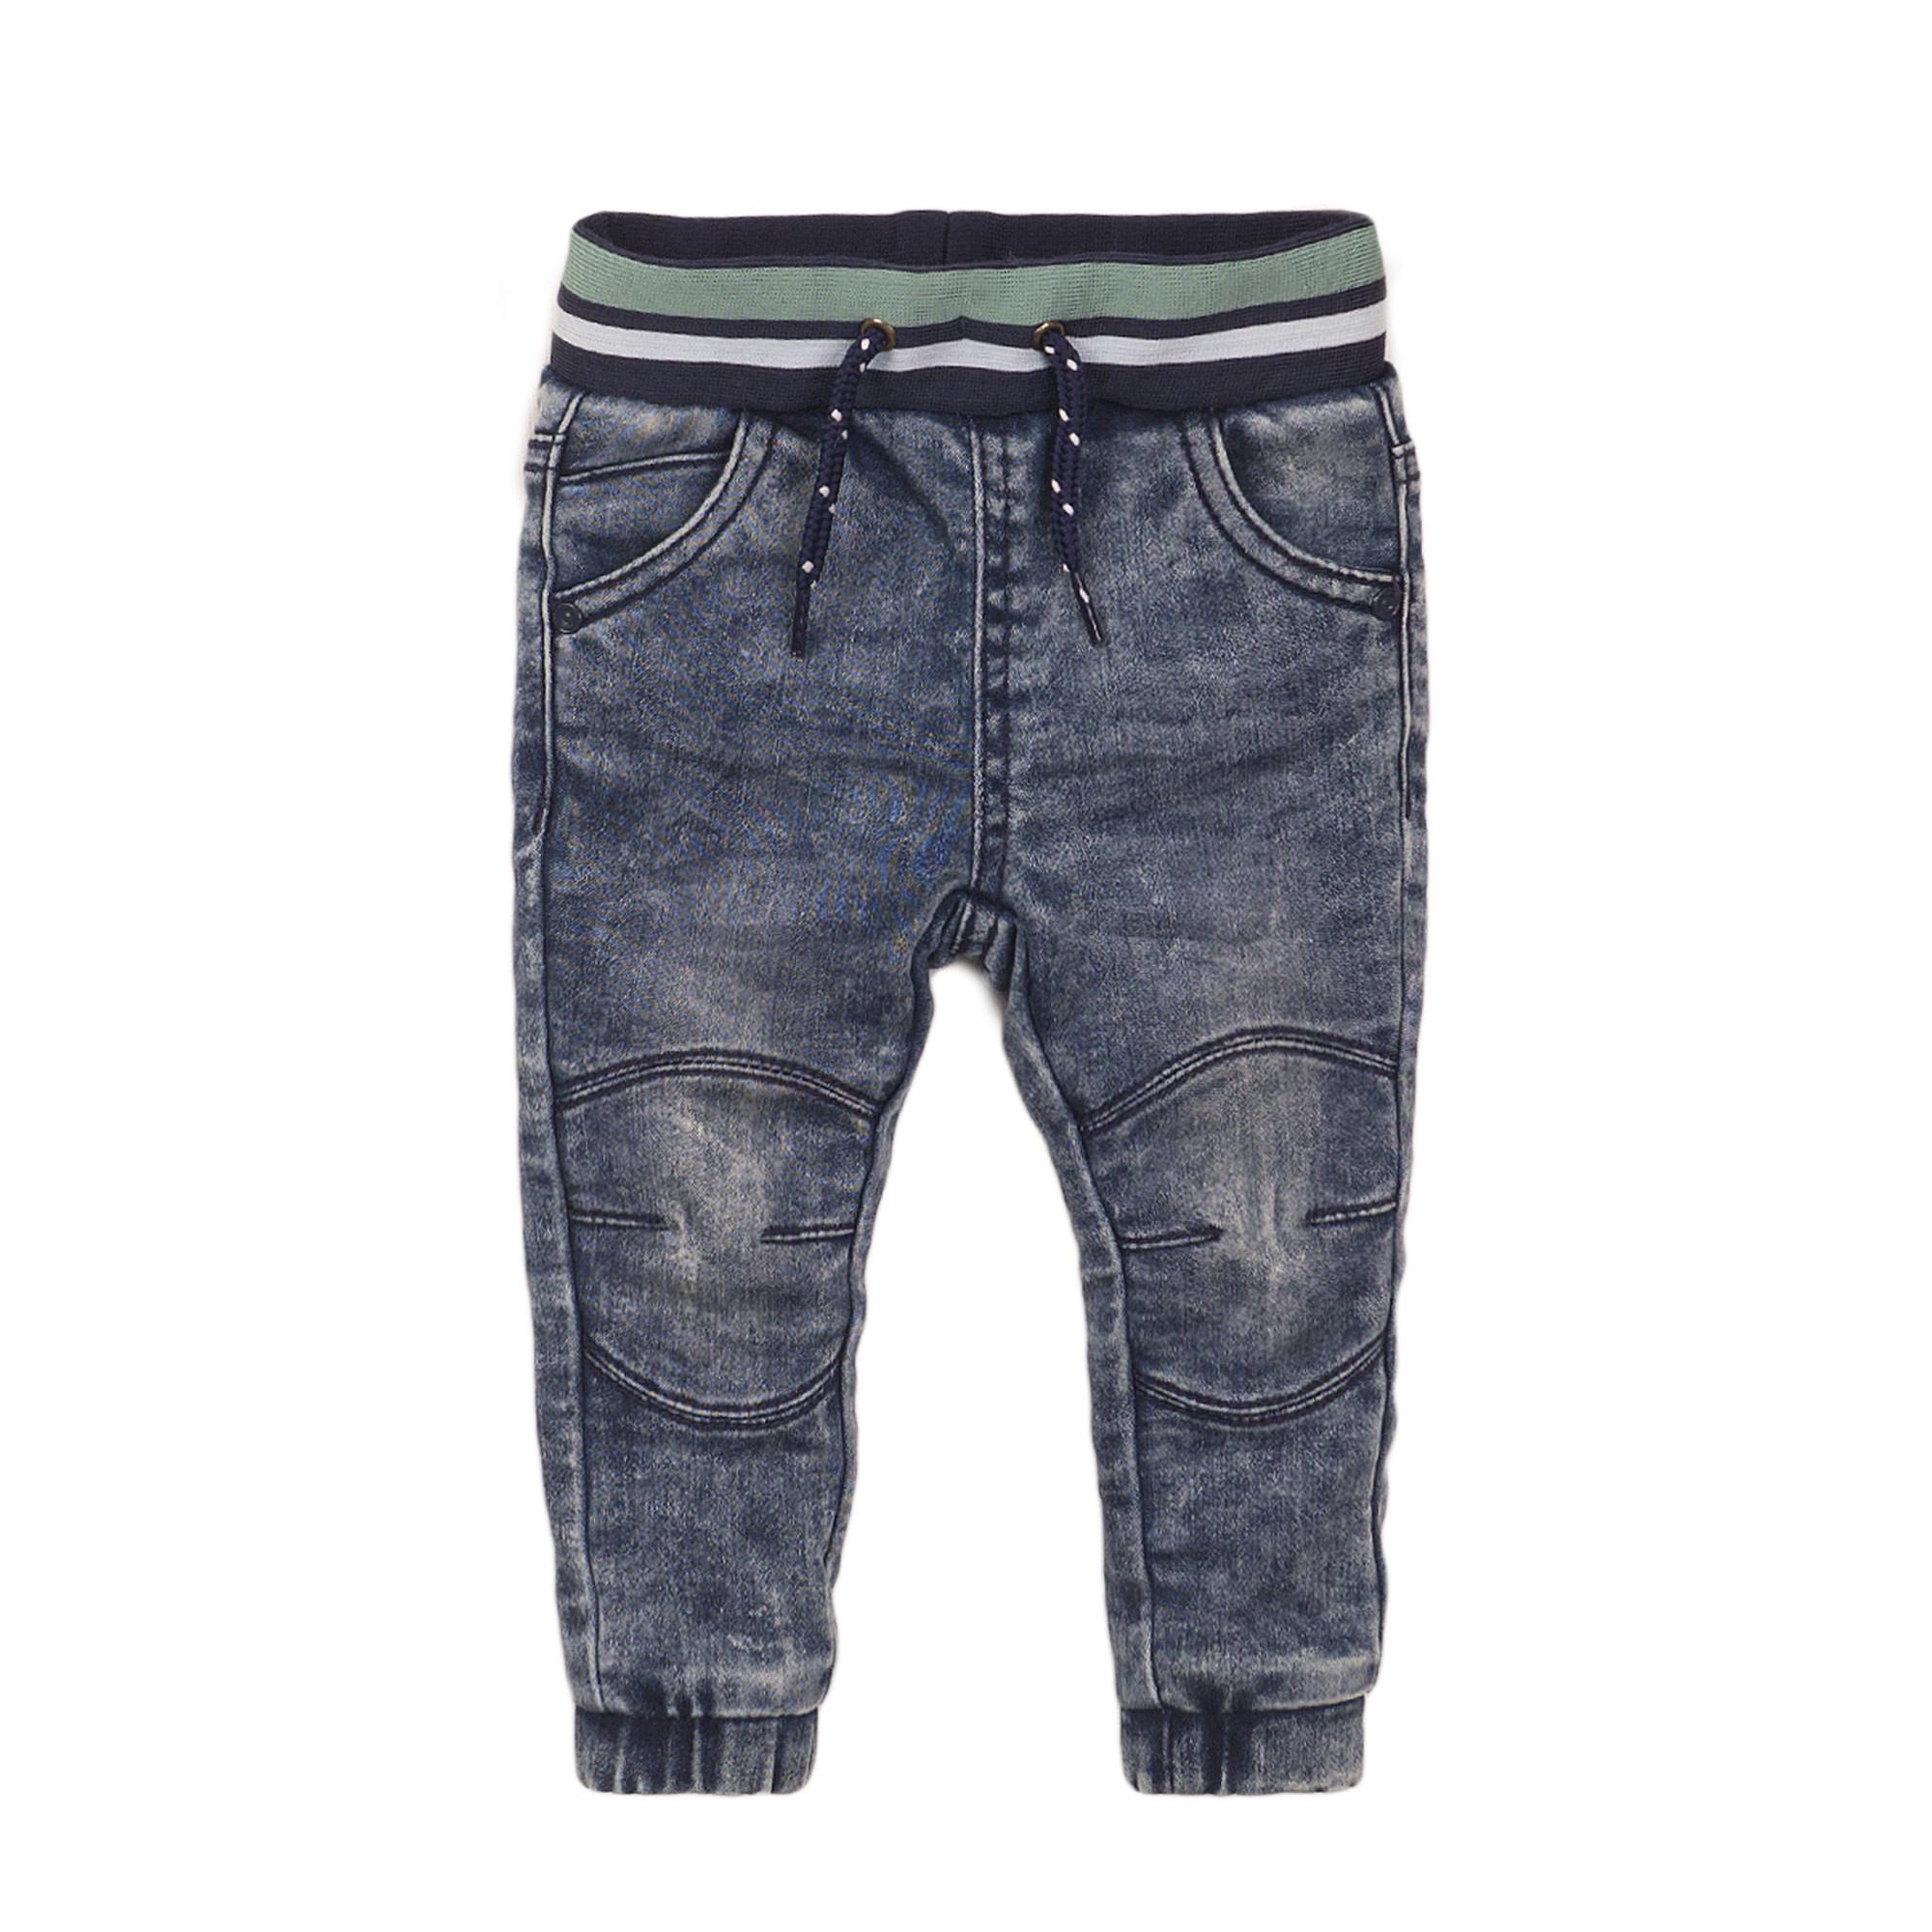 Panda Pull-On Jeans